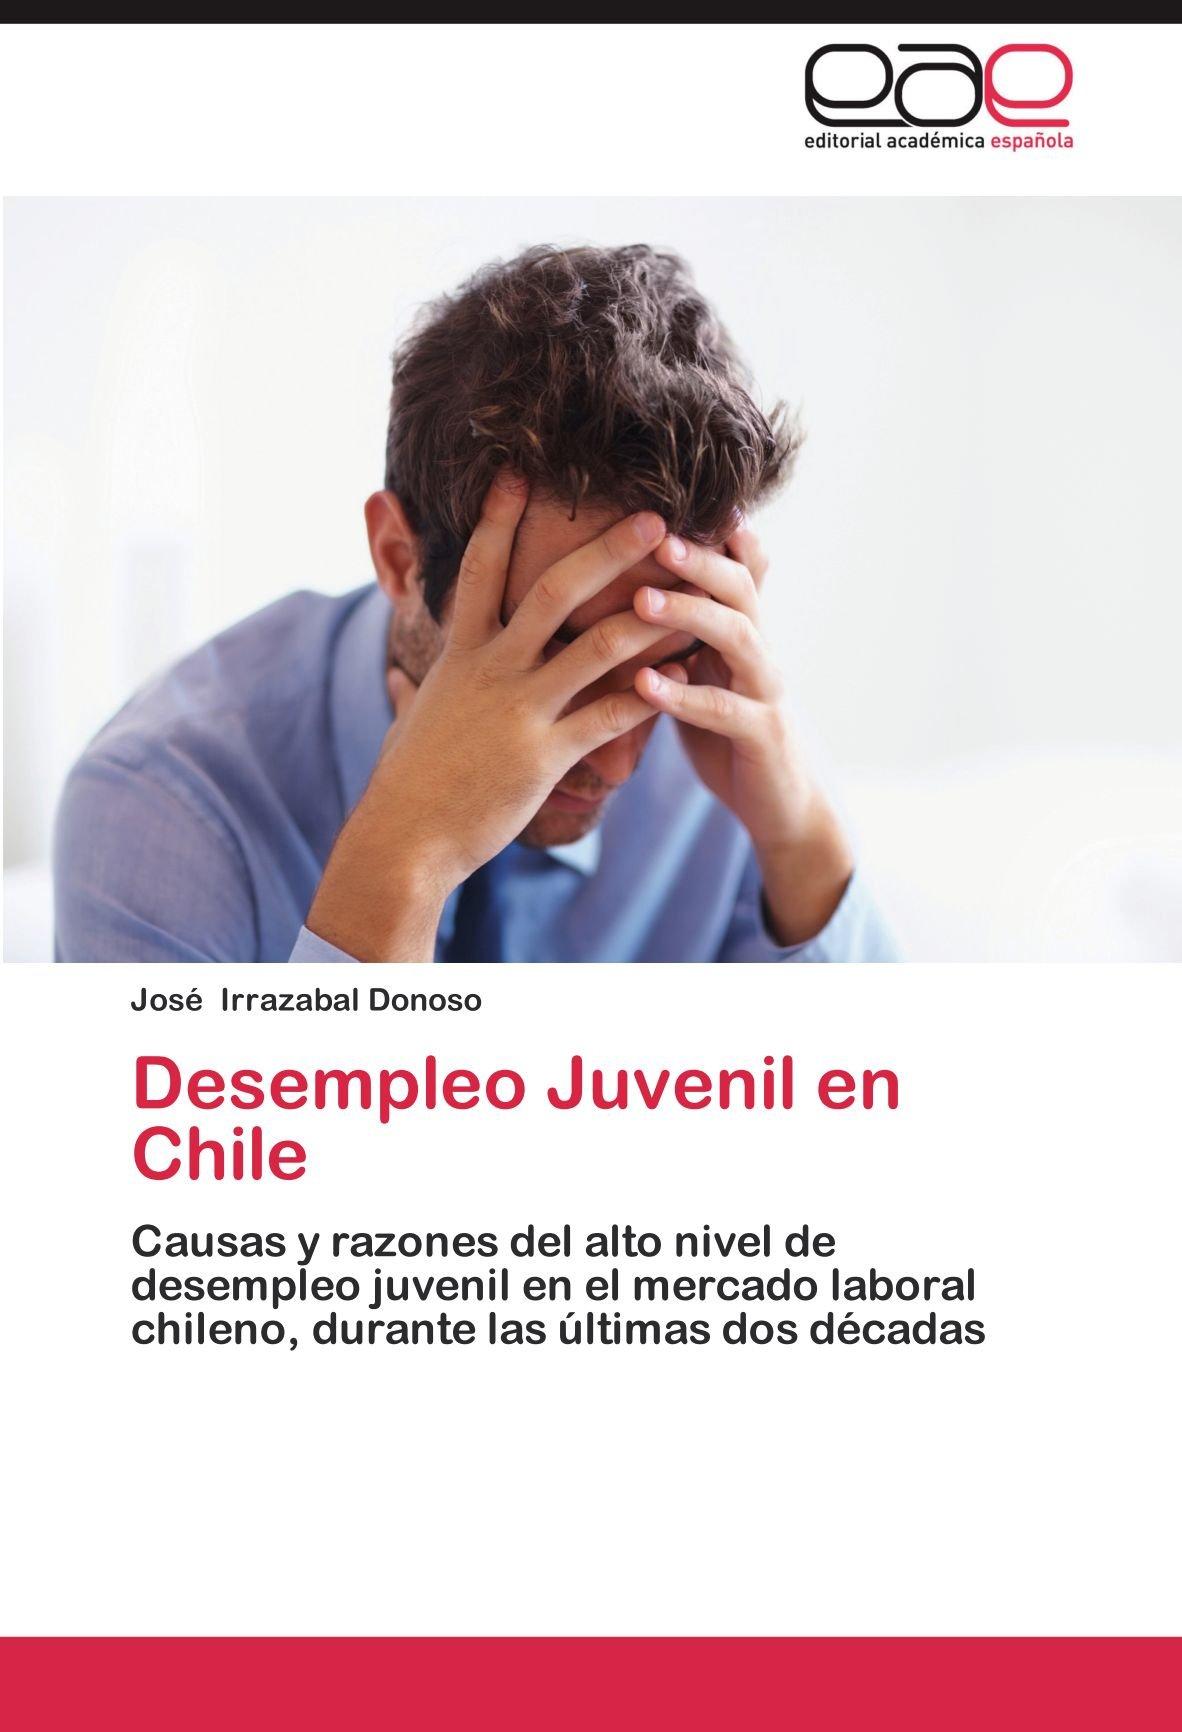 Desempleo Juvenil En Chile: Amazon.es: Jos Irrazabal Donoso, Jose Irrazabal Donoso: Libros